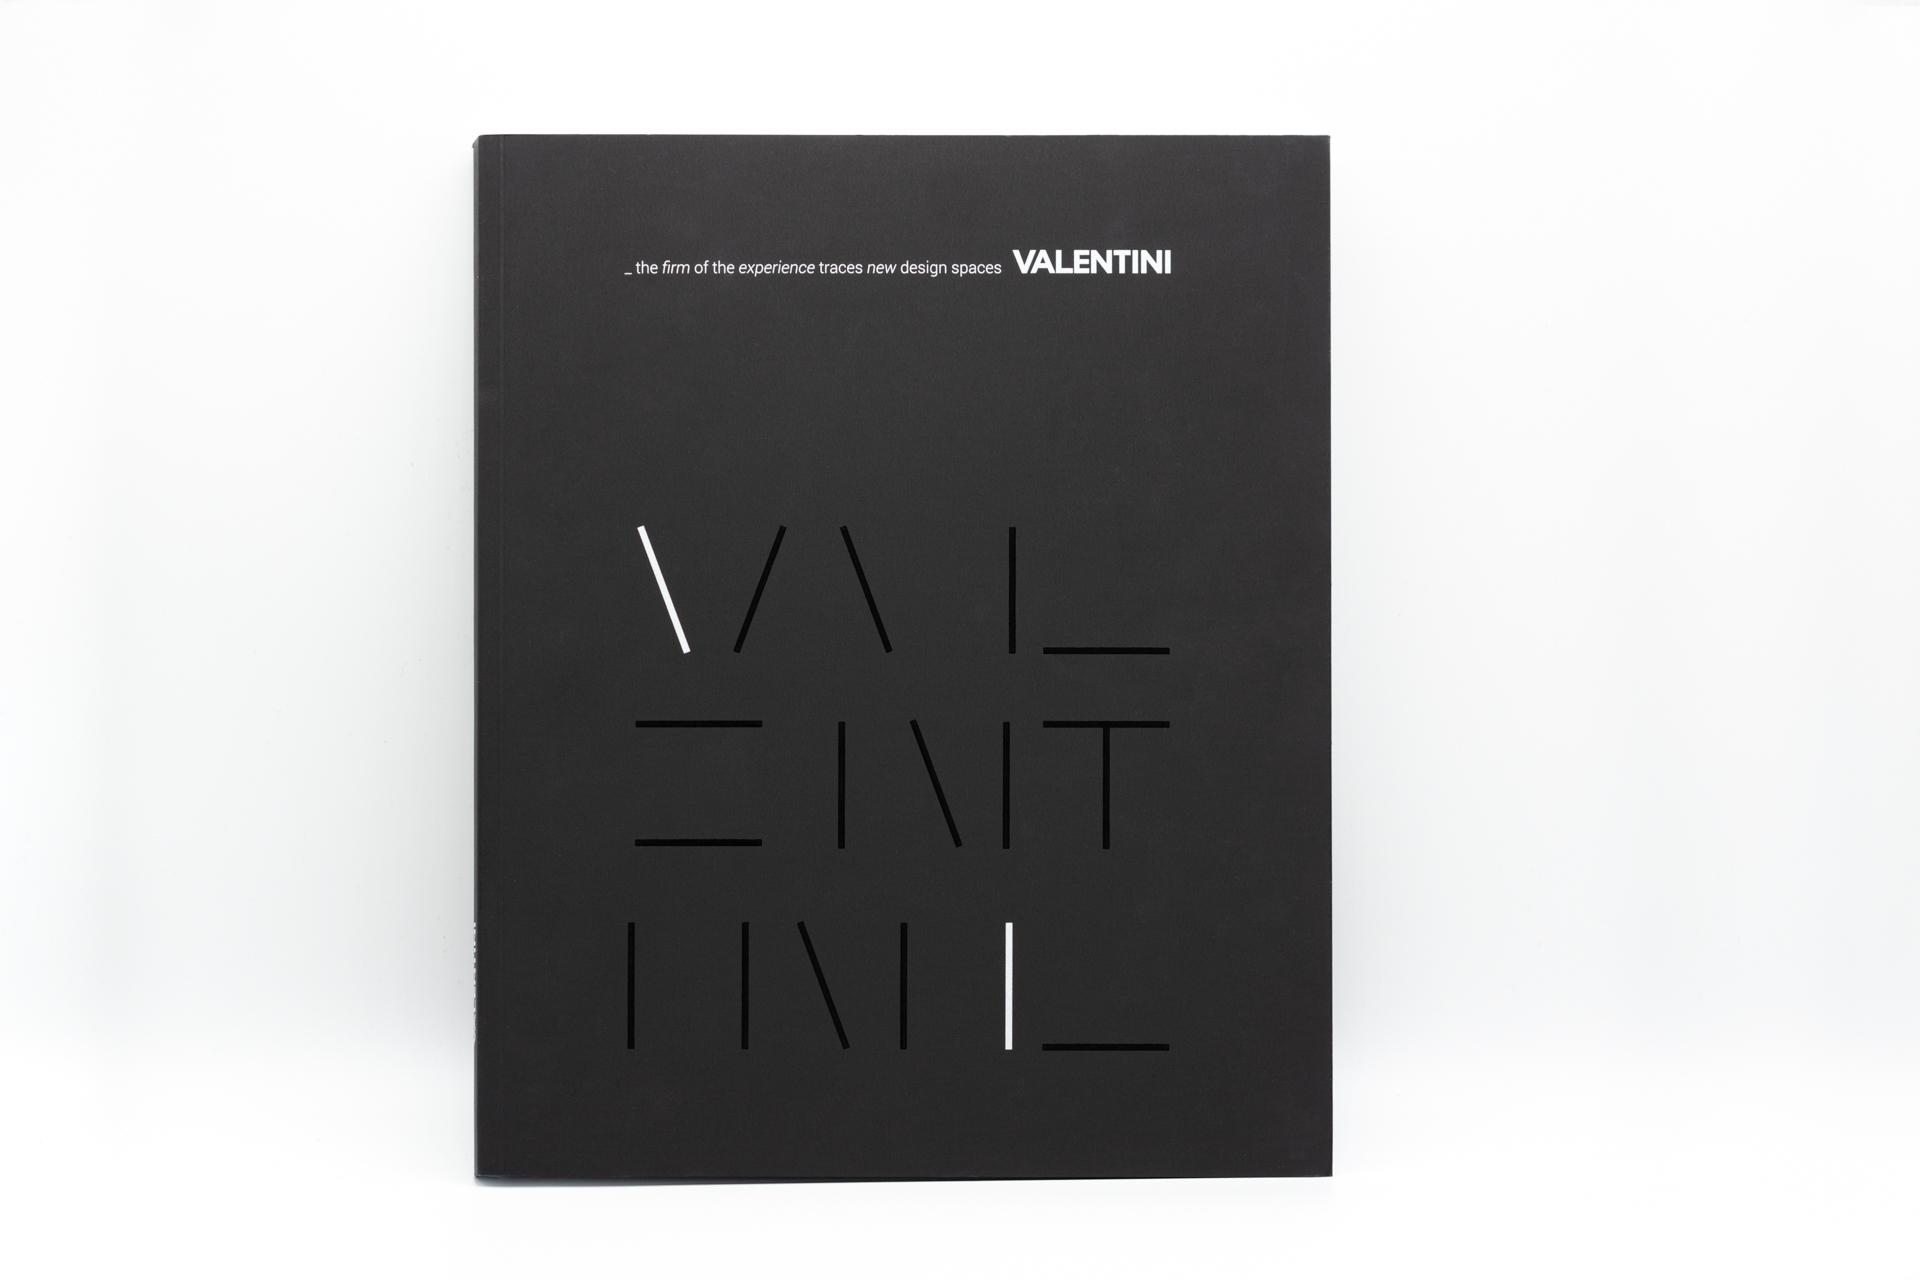 valentini-catalogo-copertina